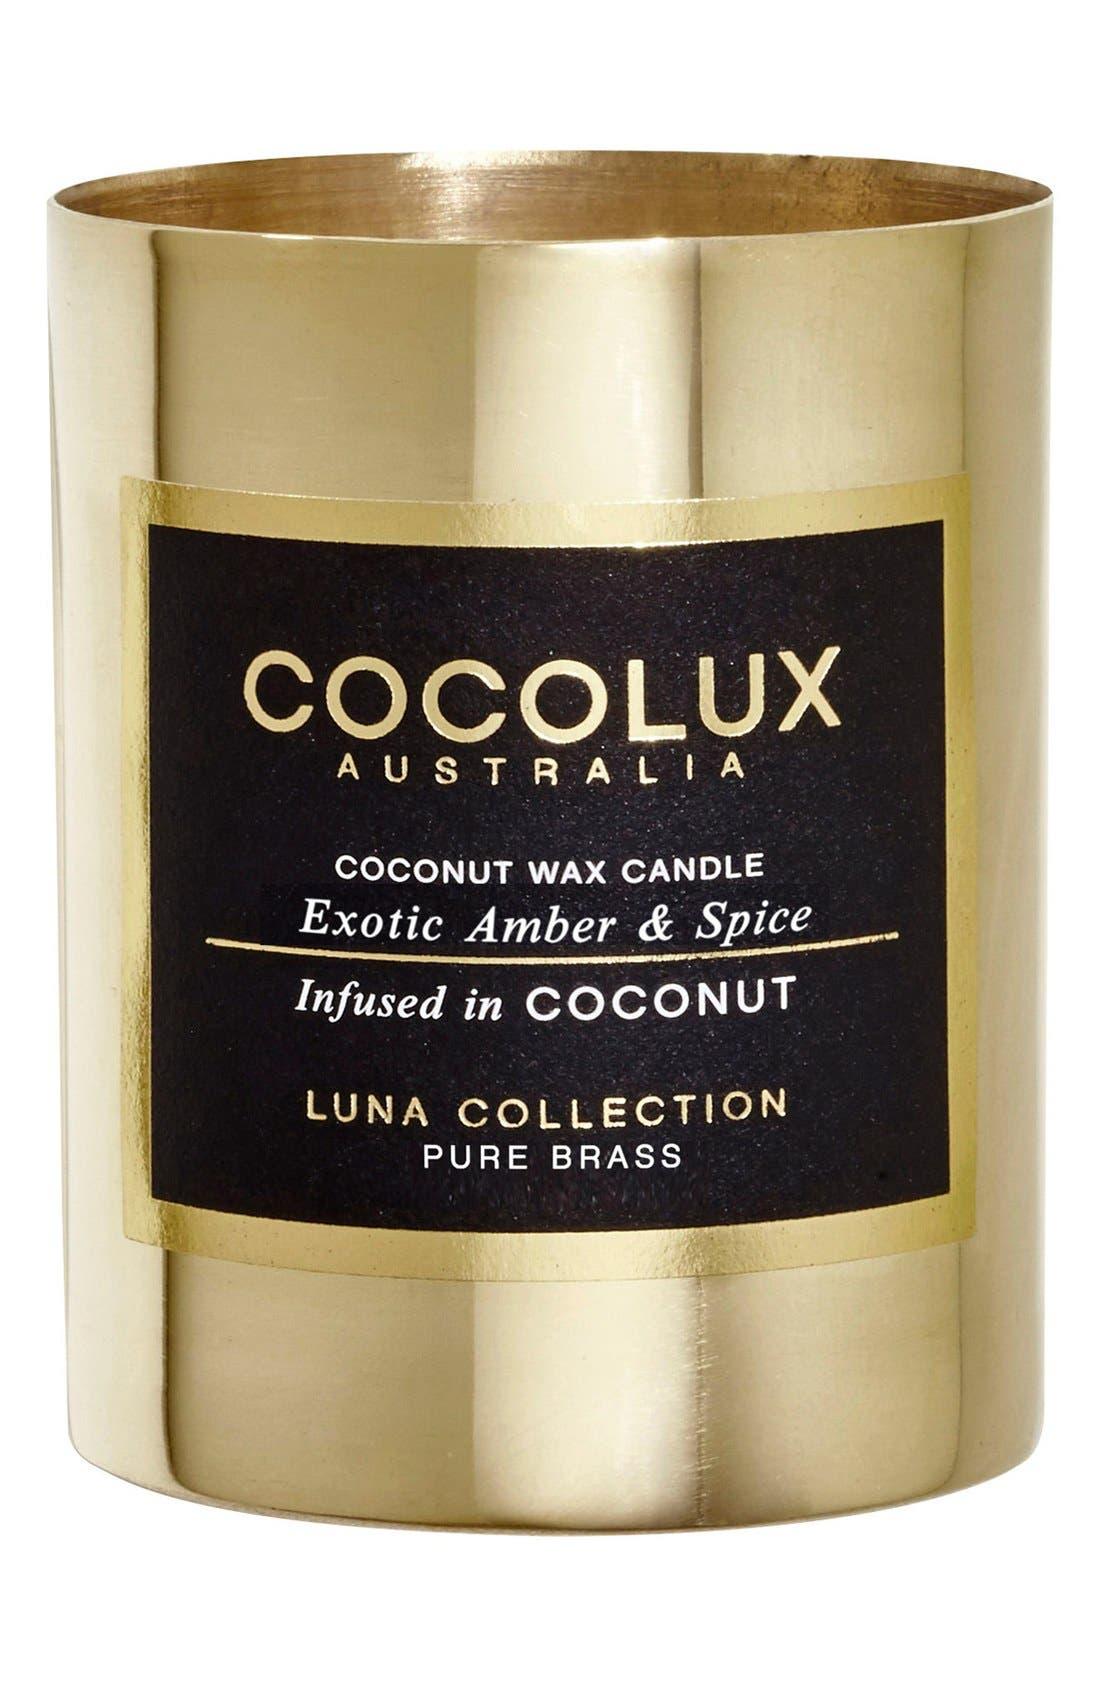 COCOLUX AUSTRALIA Exotic Amber & Spice Small Brass